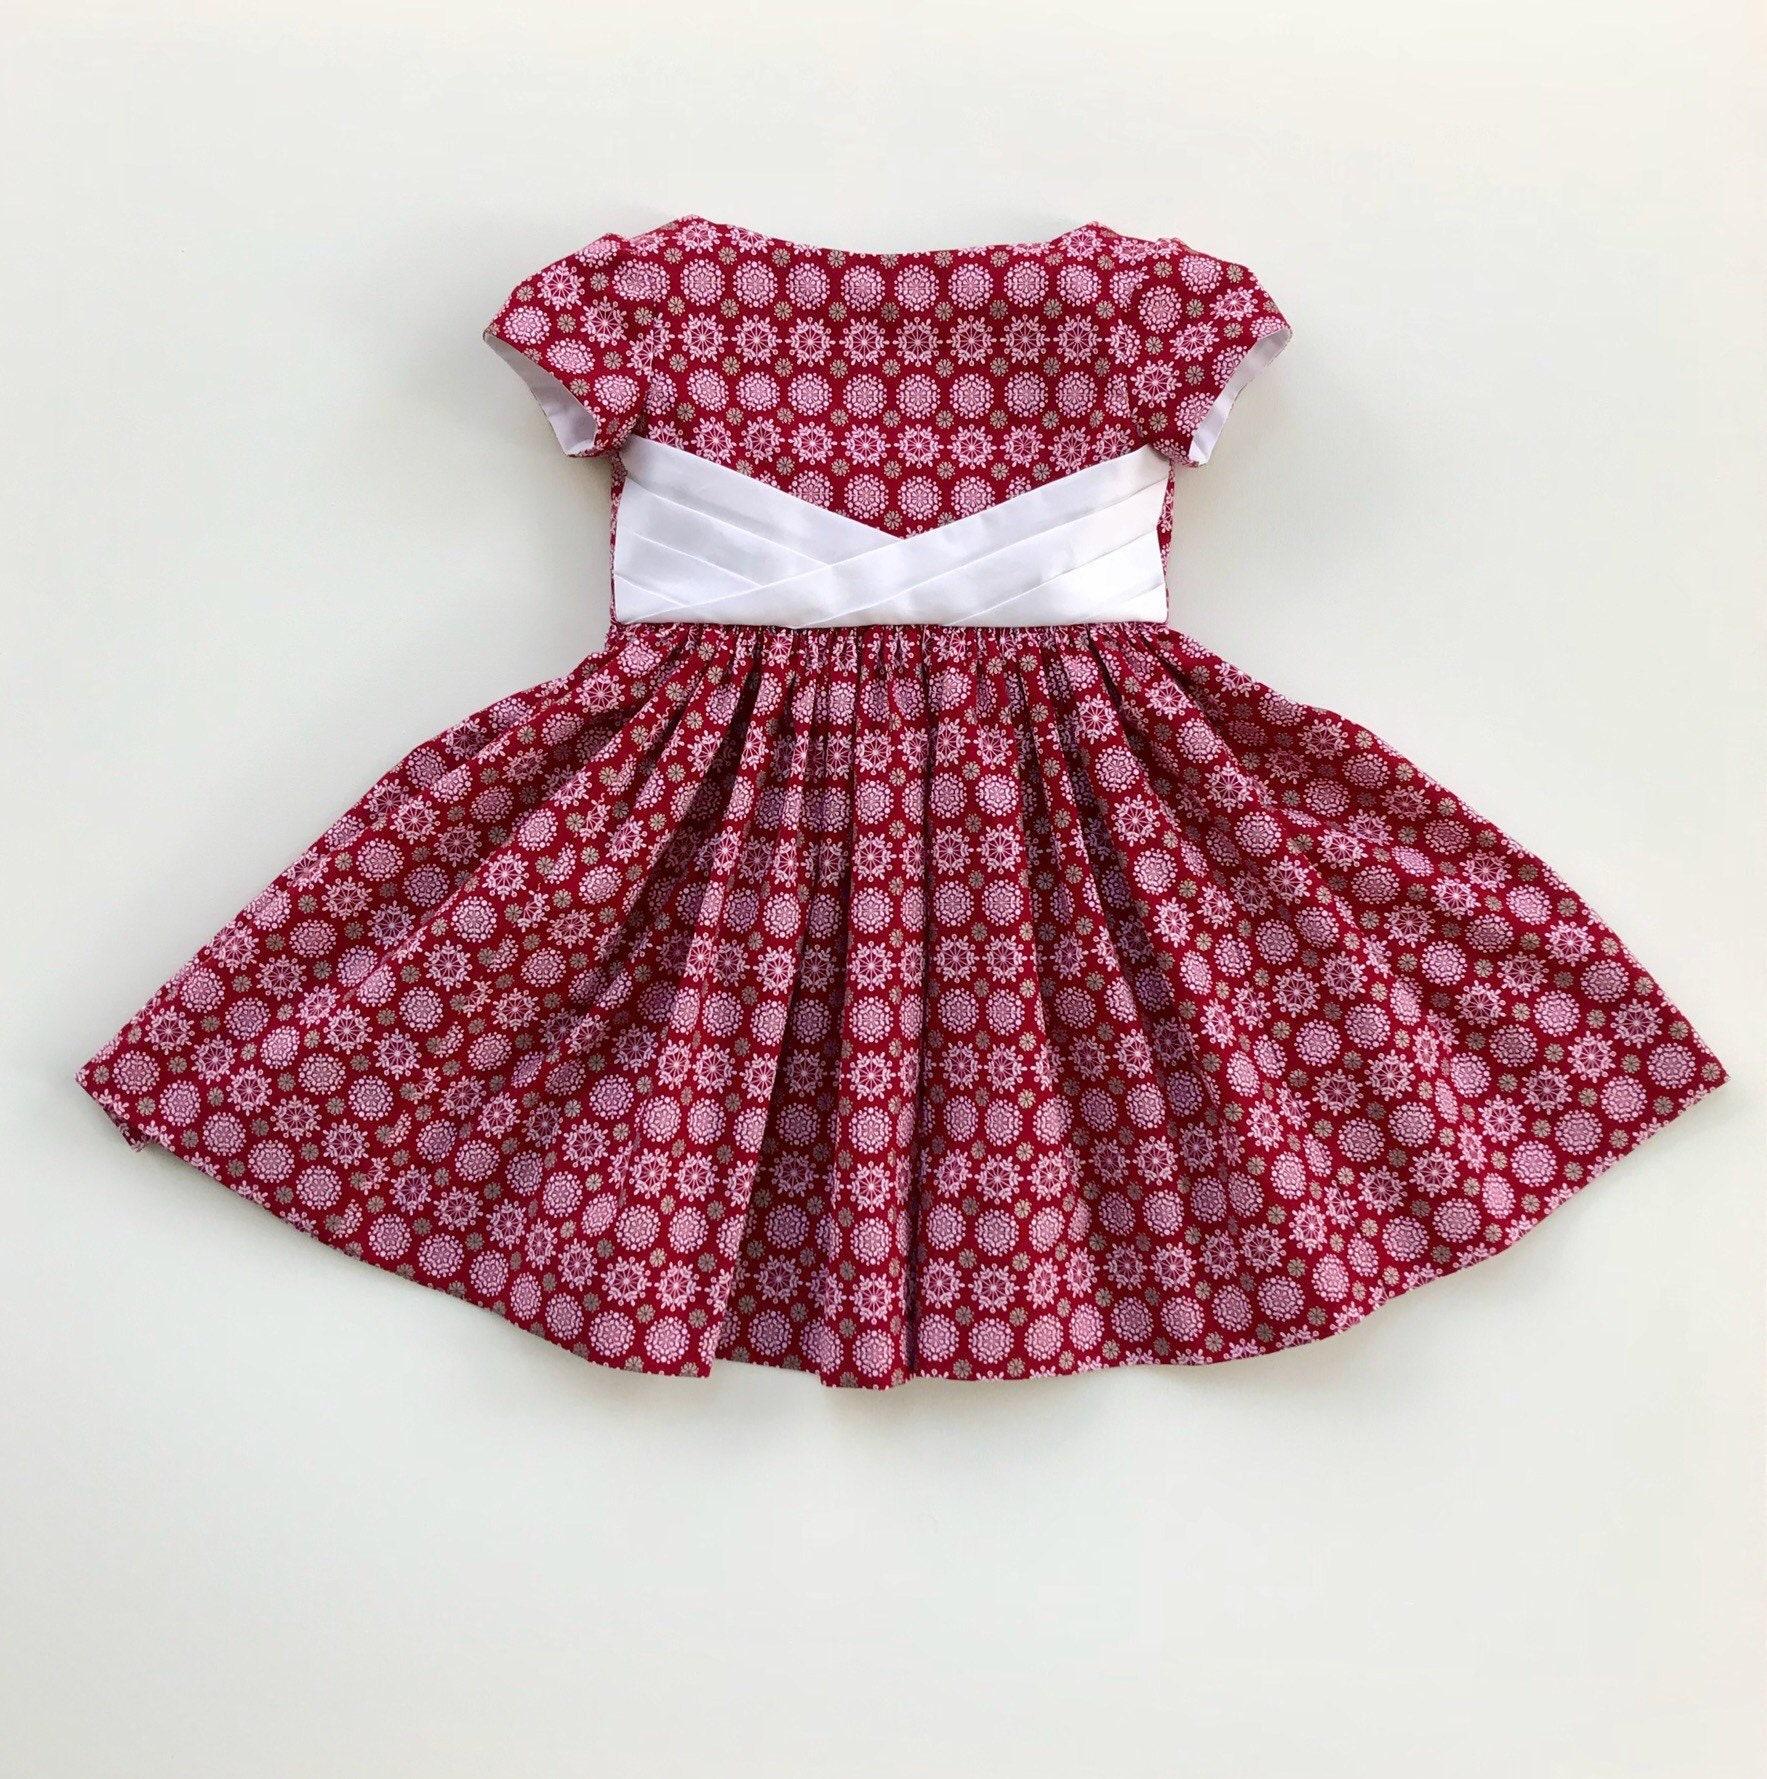 080b15fd1fc3 Little Girls Holiday Dresses